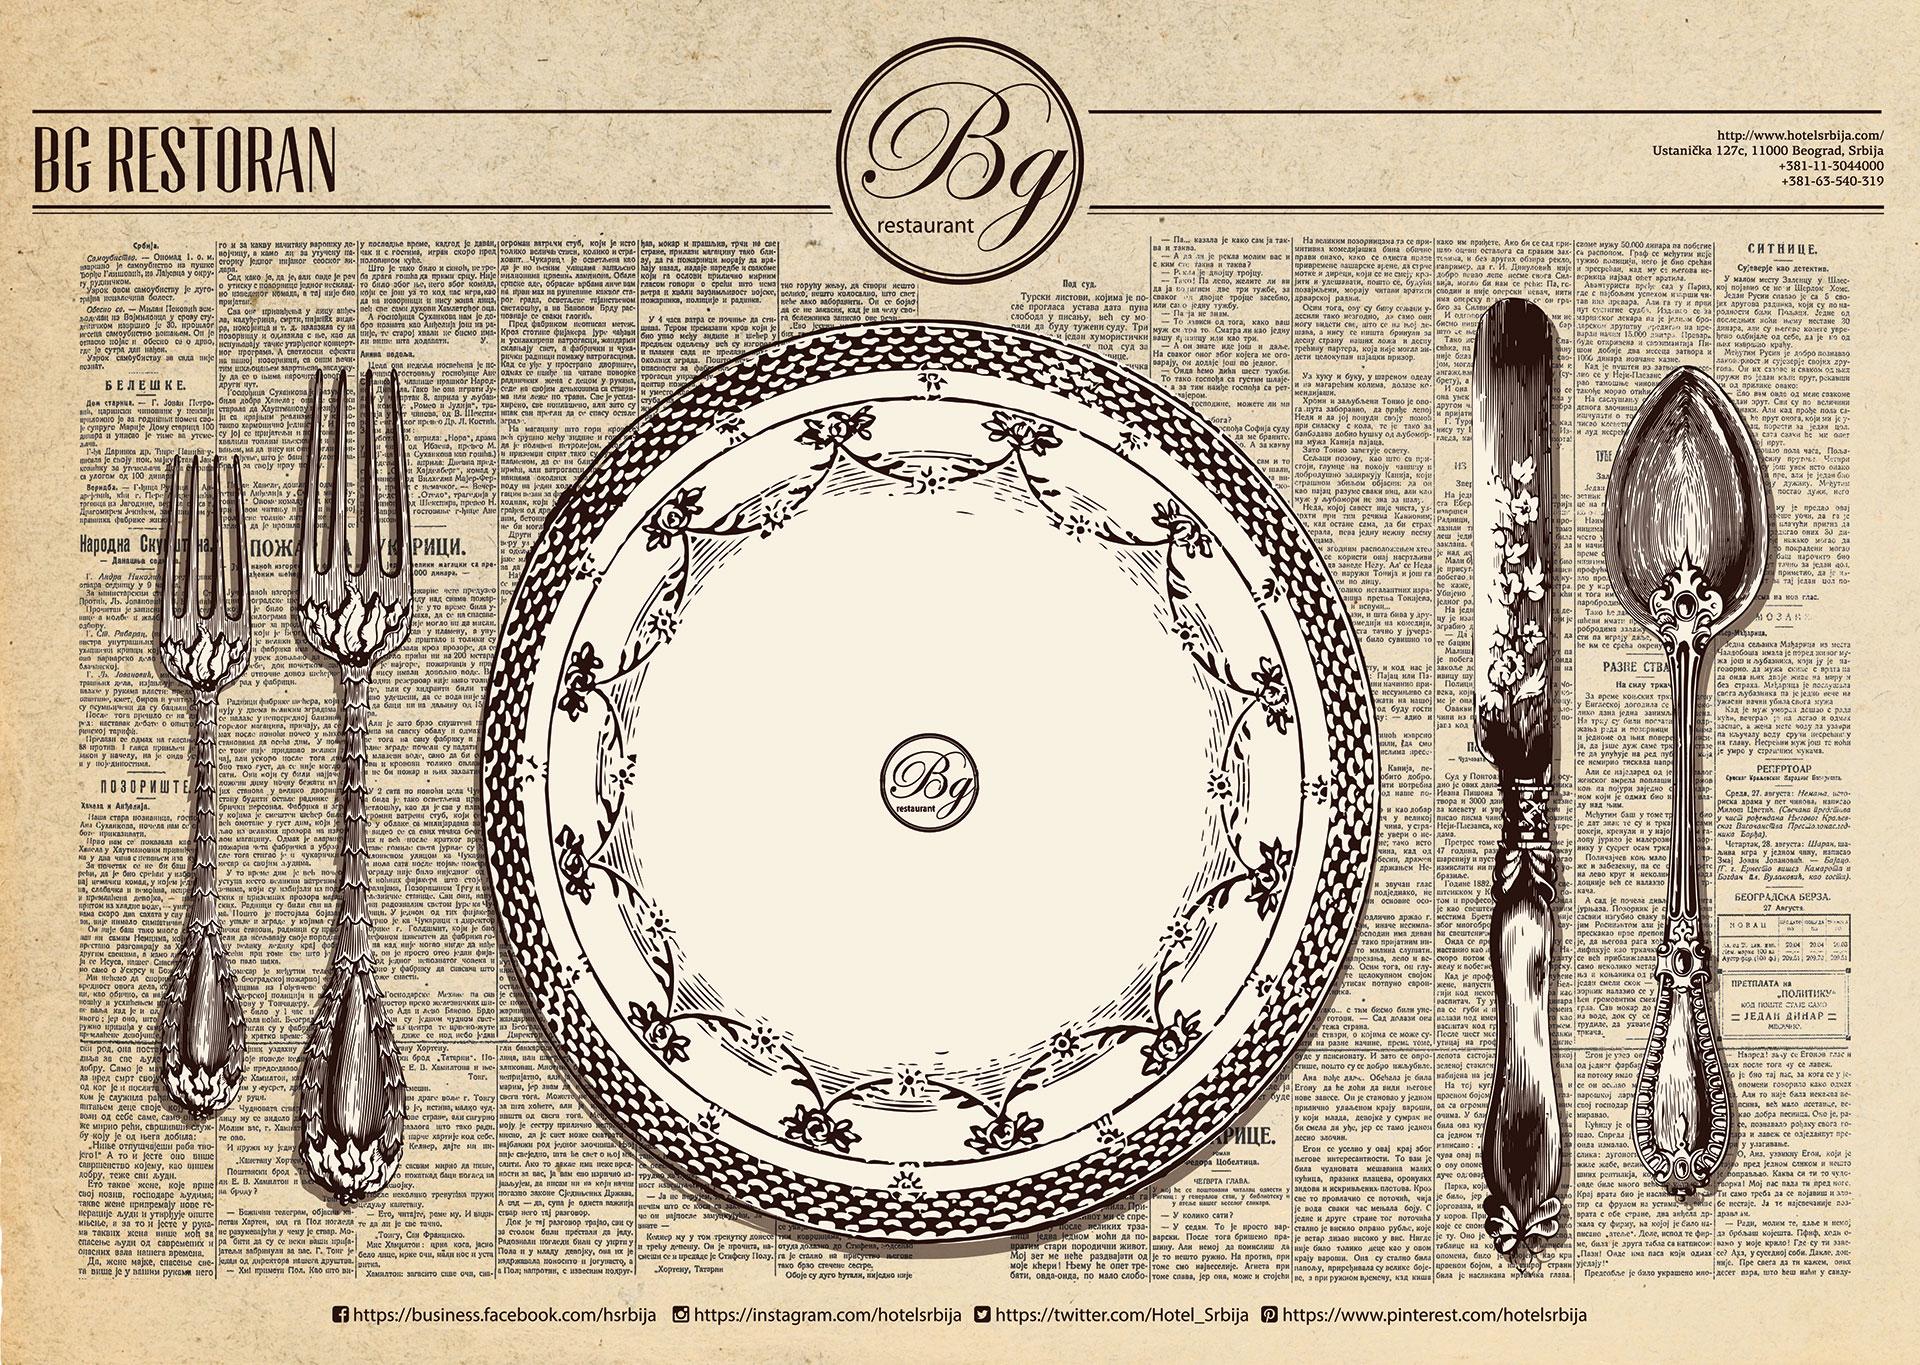 Dizajn vintage podloge za tanjir (placemate) za Hotel Srbiju